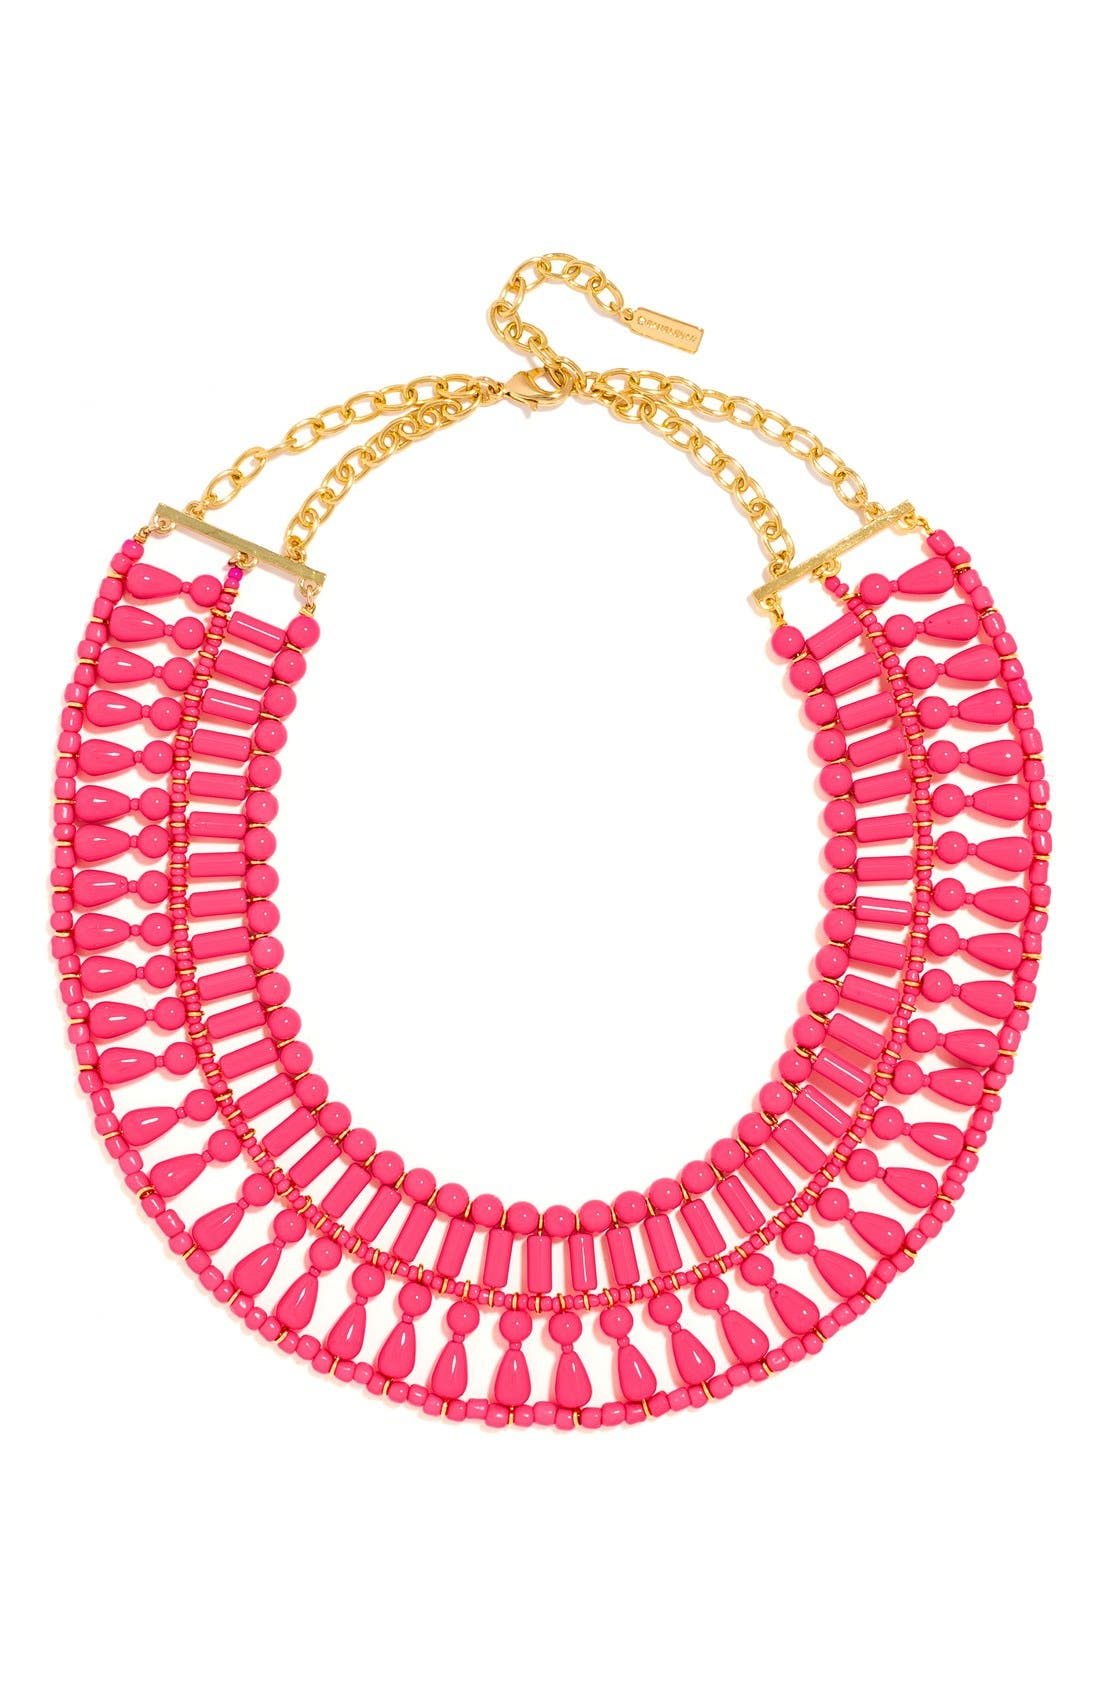 Main Image - BaubleBar 'Riviera' Collar Necklace